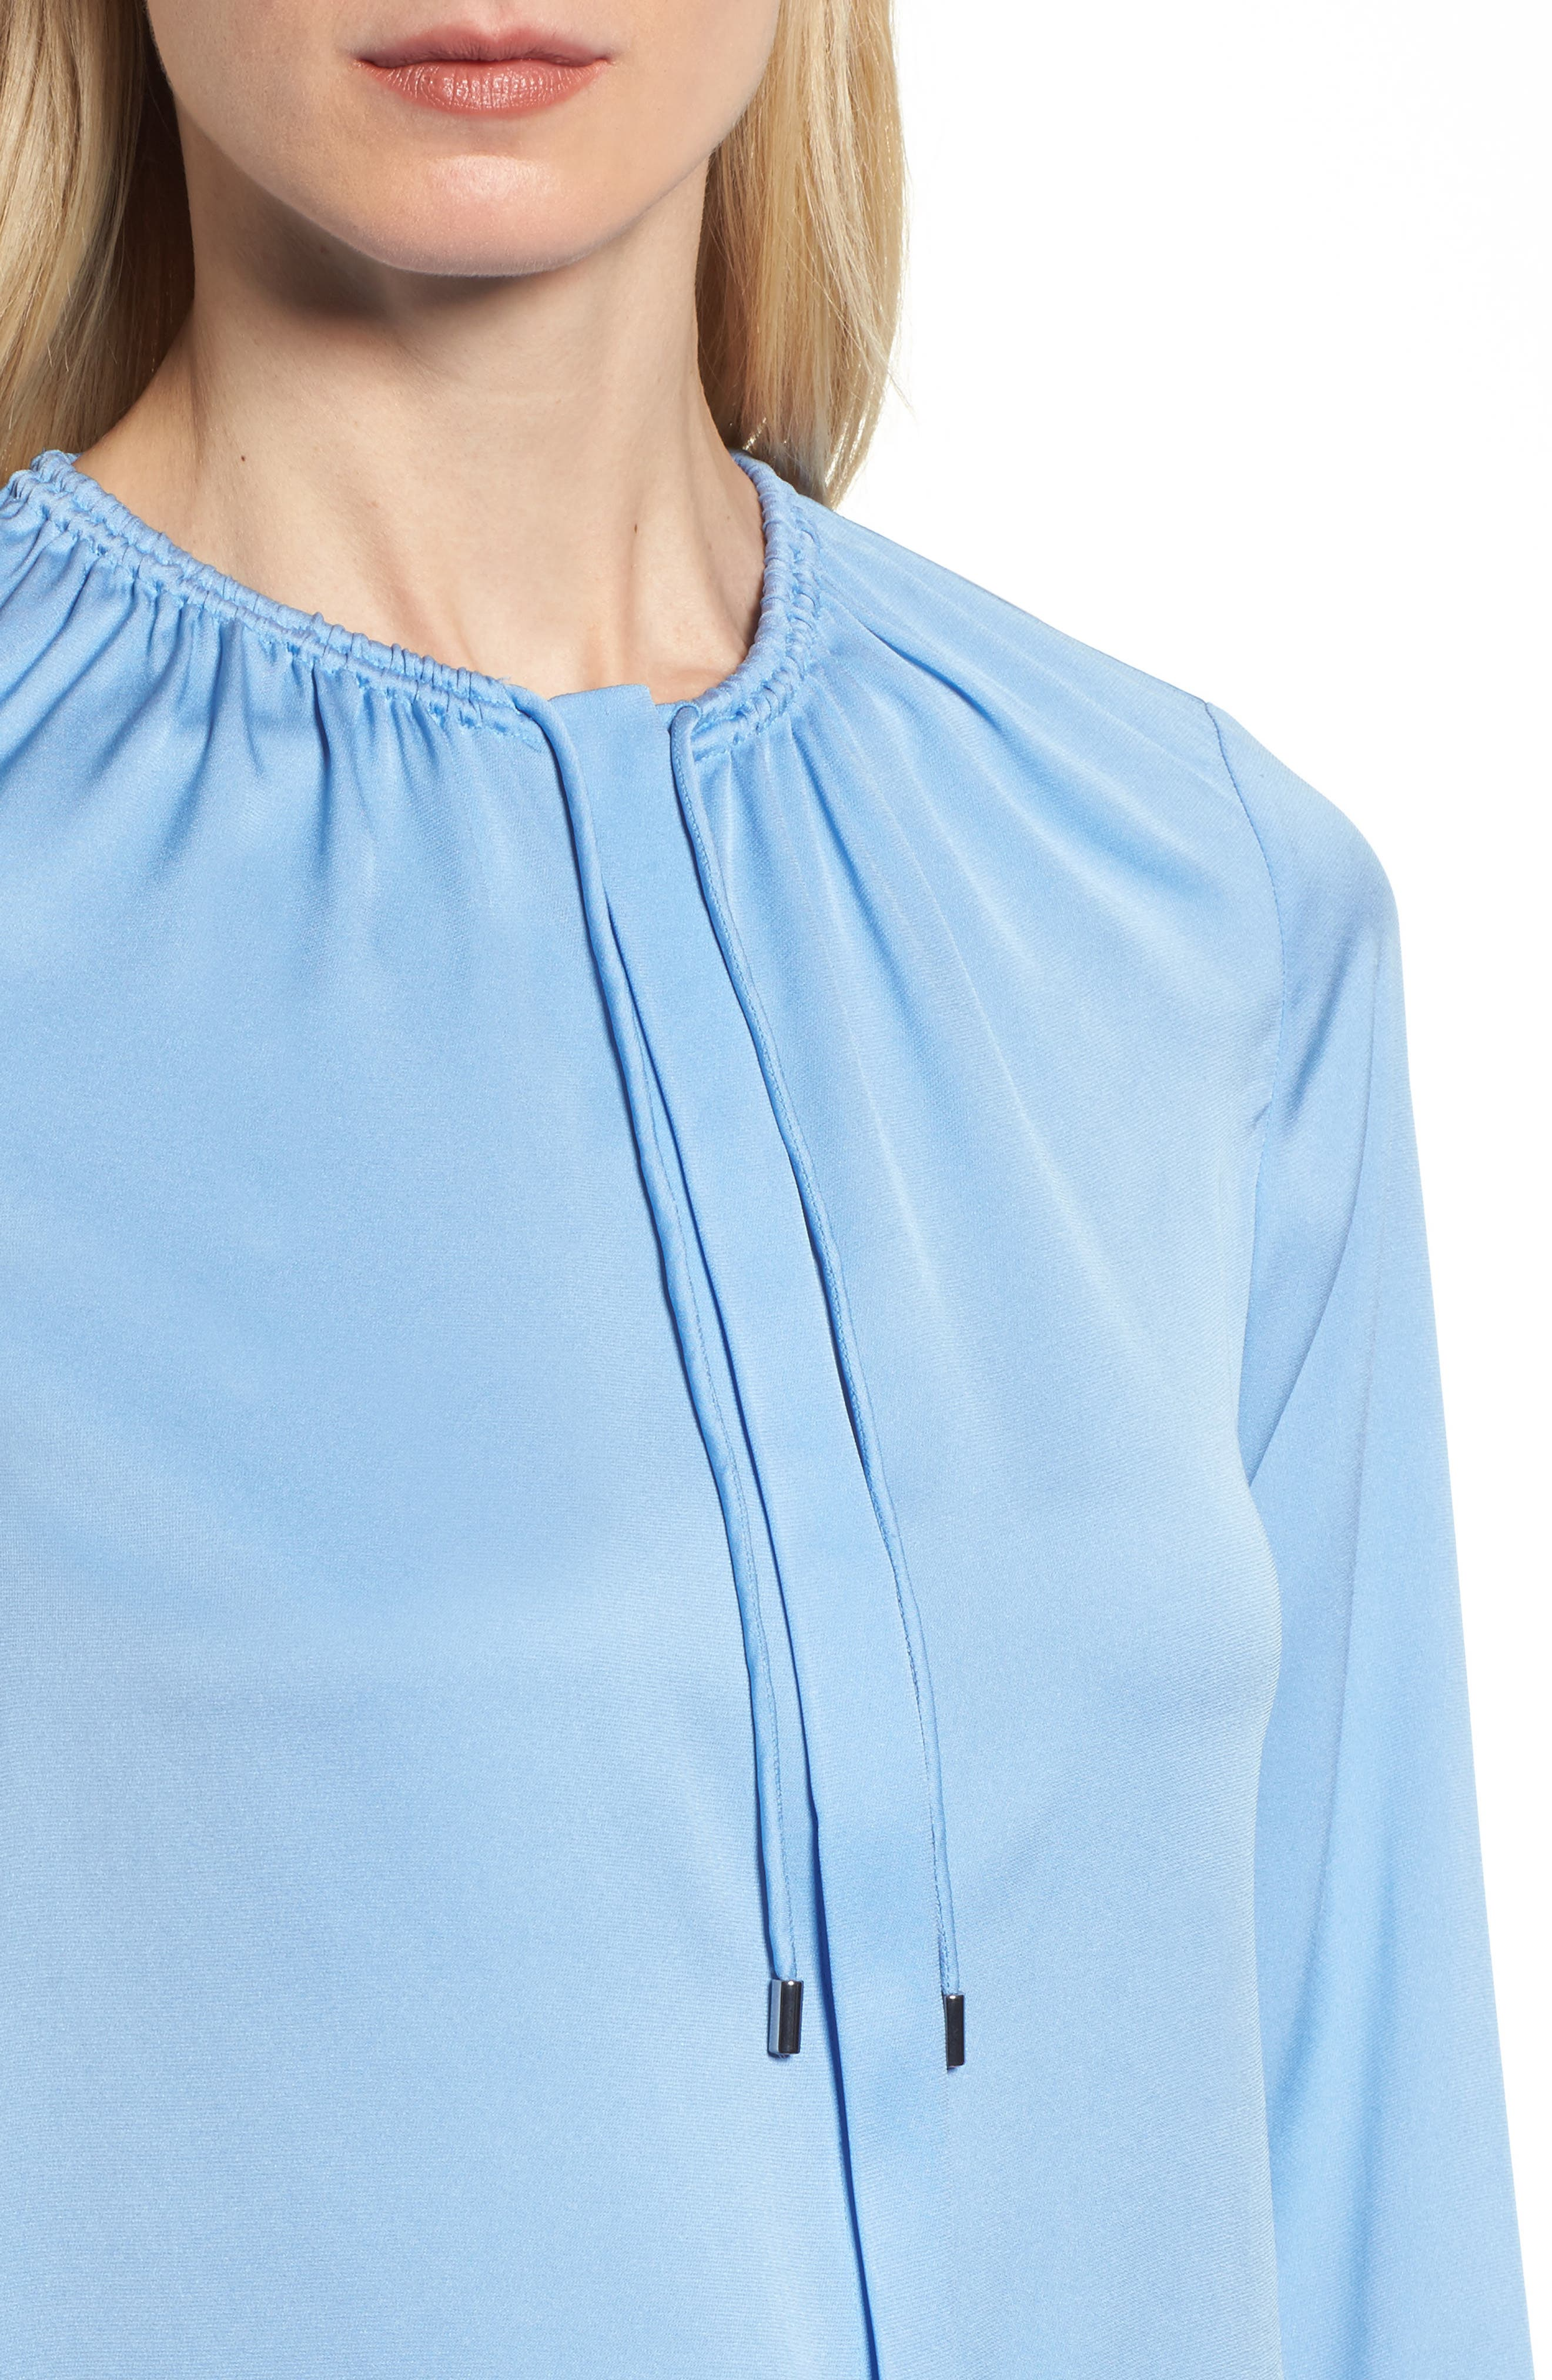 Banorana Stretch Silk Blouse,                             Alternate thumbnail 4, color,                             Blue Sky